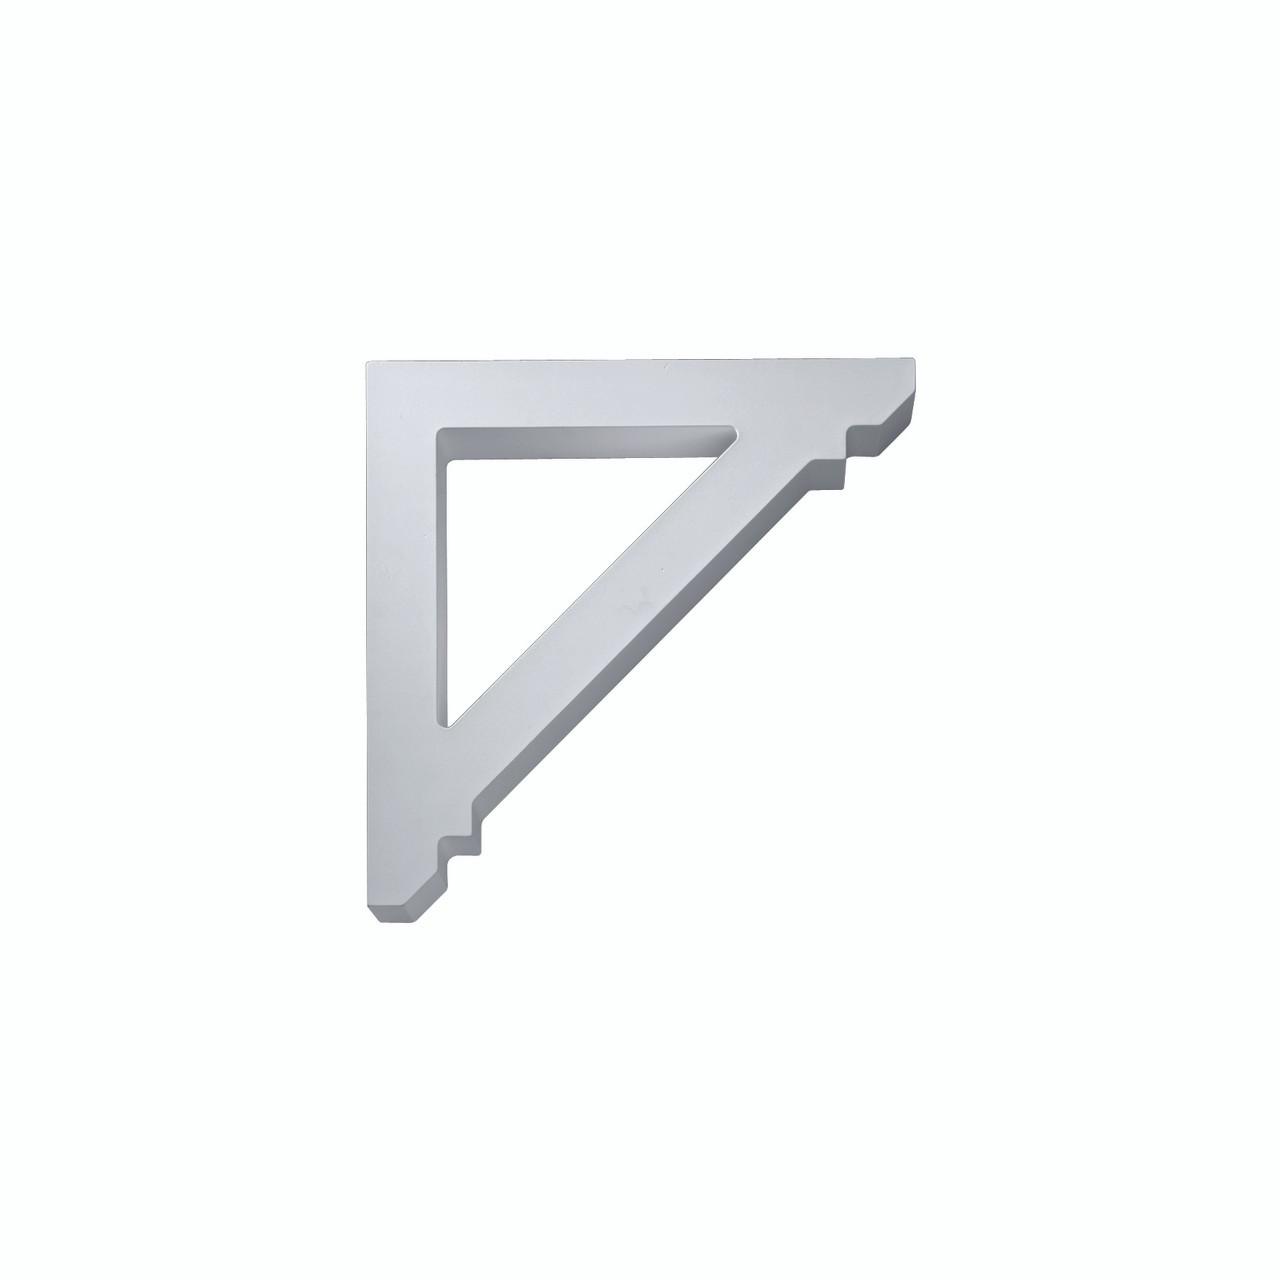 Bkt16x16 for Fypon quick rail